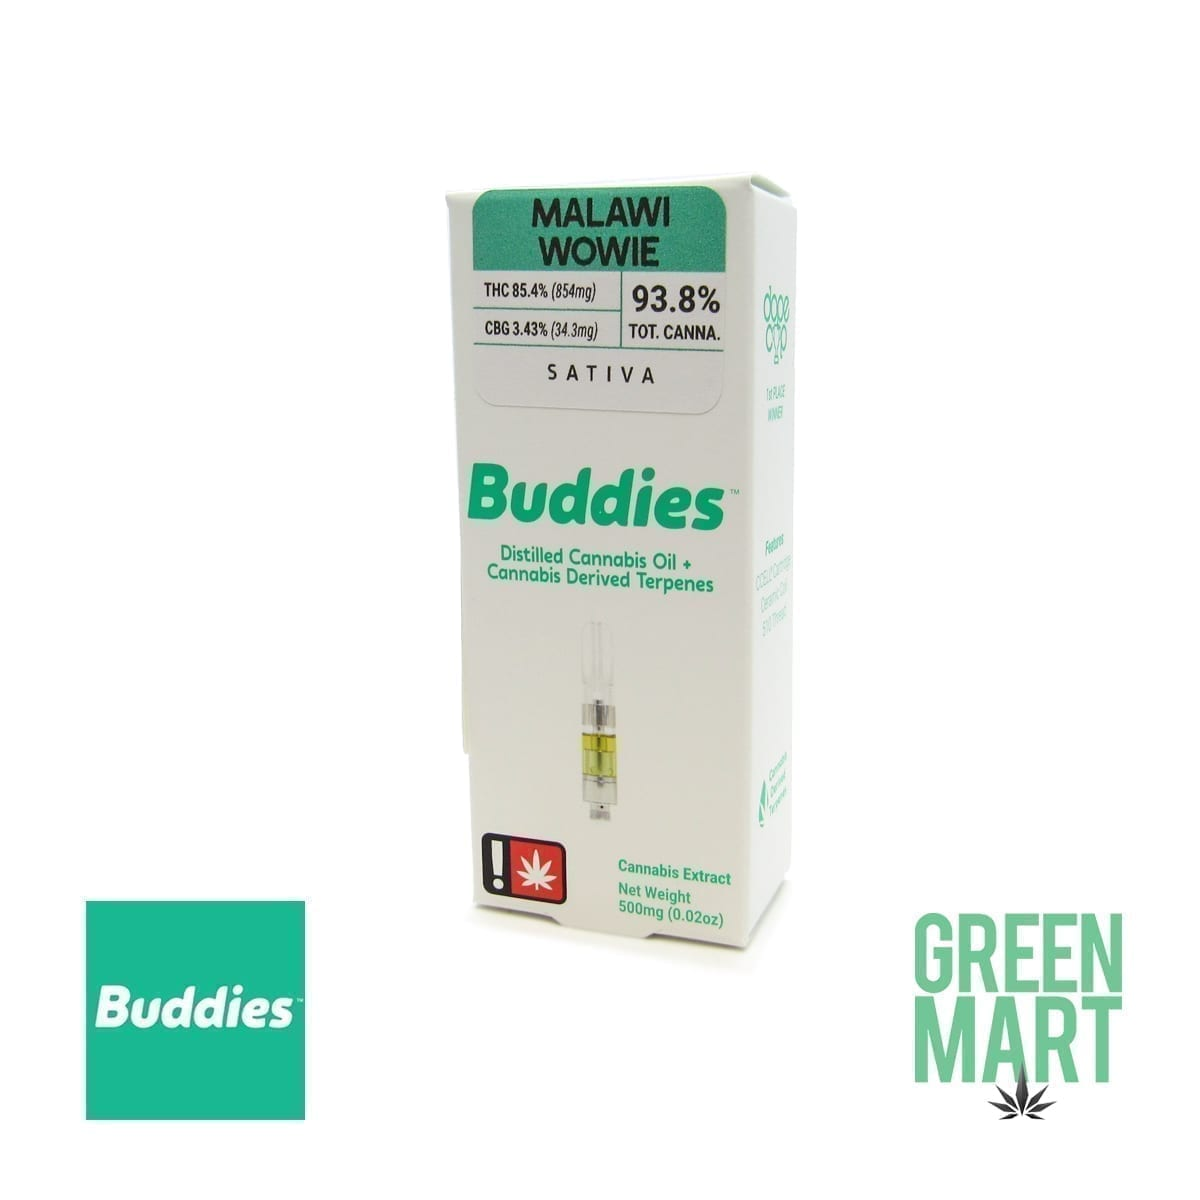 Buddies Brand Distillate Cartridge - Malawi Wowie